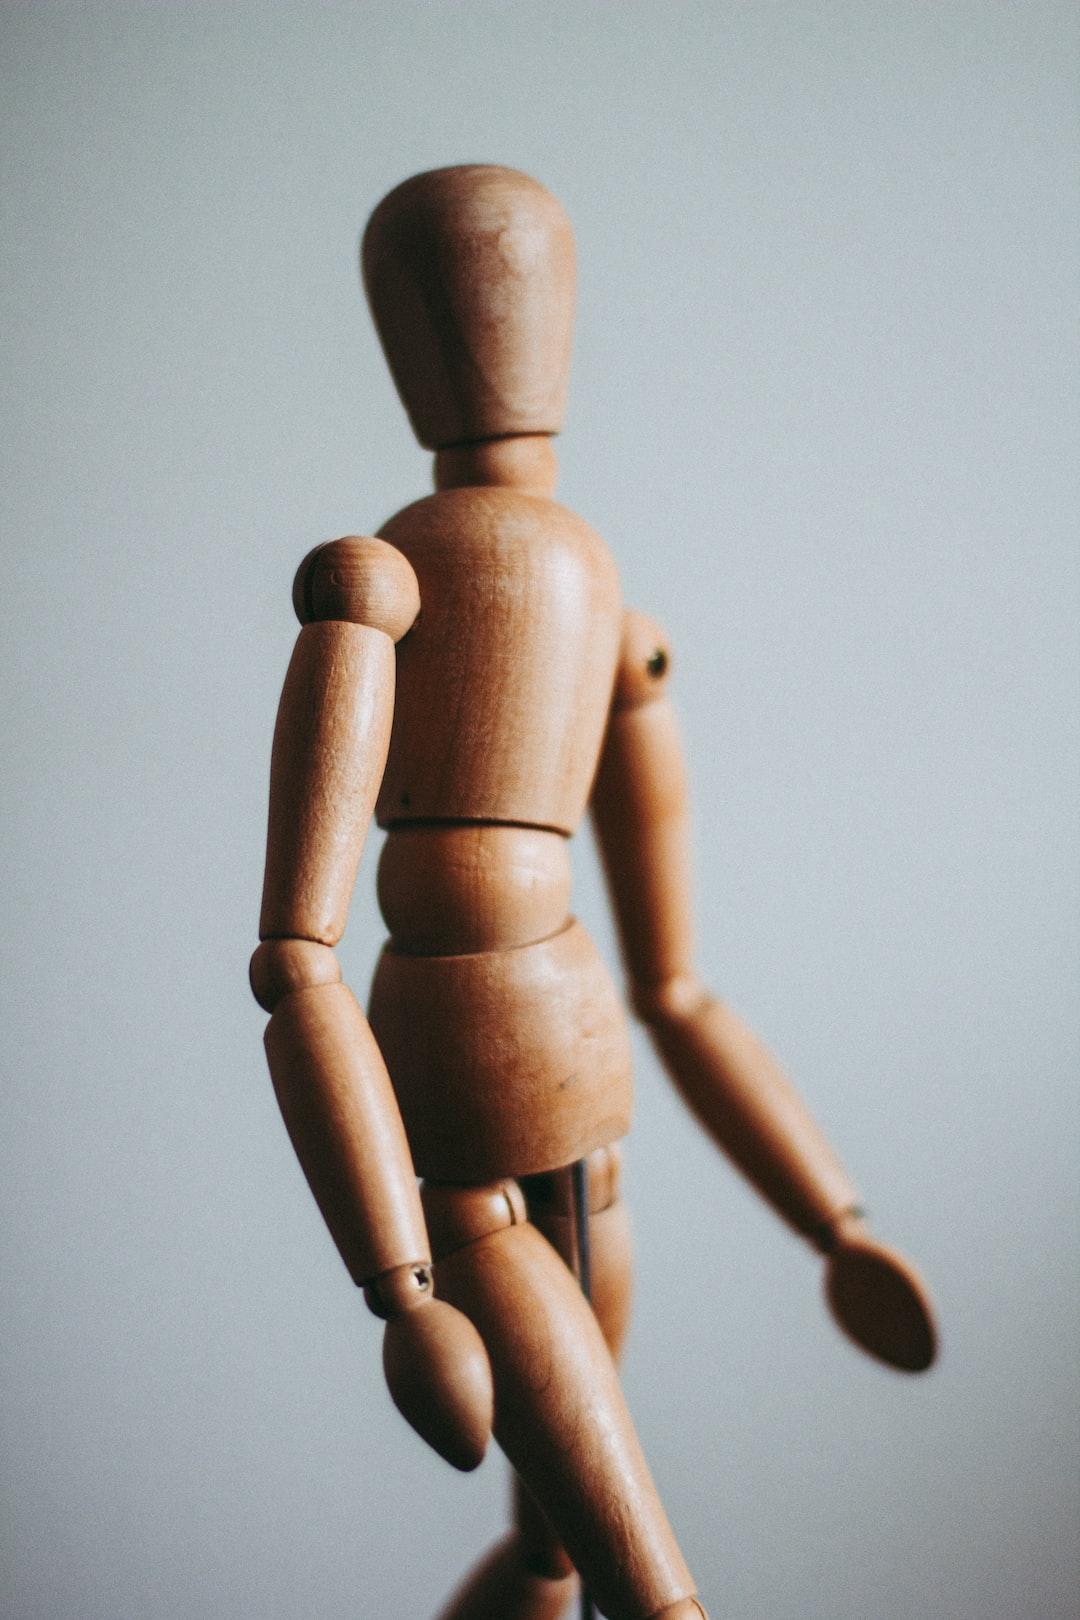 Wooden model doll